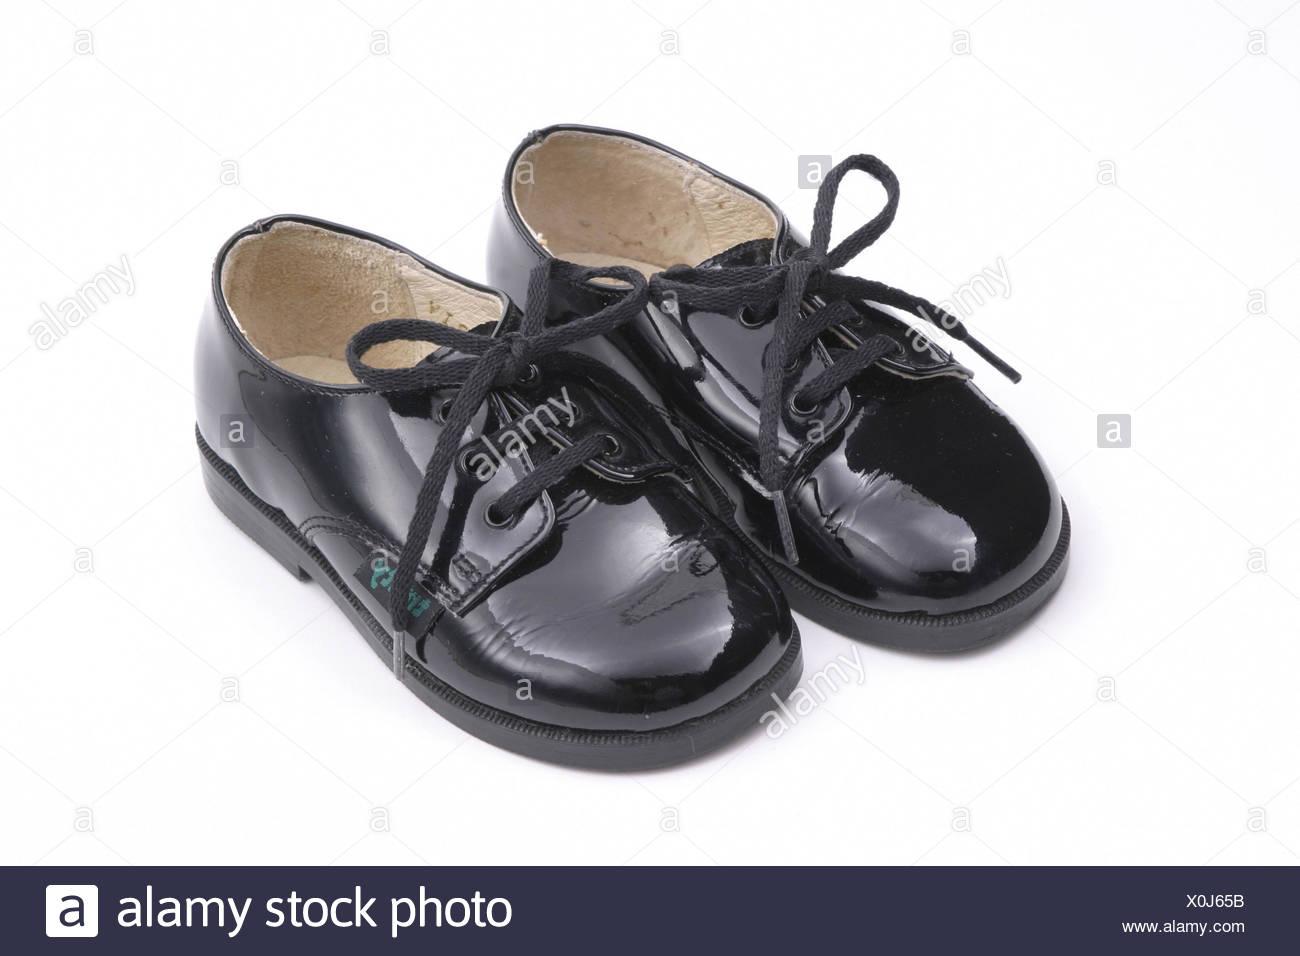 buy cheap f2ef3 b0ddf Kinderschuhe, schwarzes Mädchen Schuhe, Lackschuhe, Lack ...